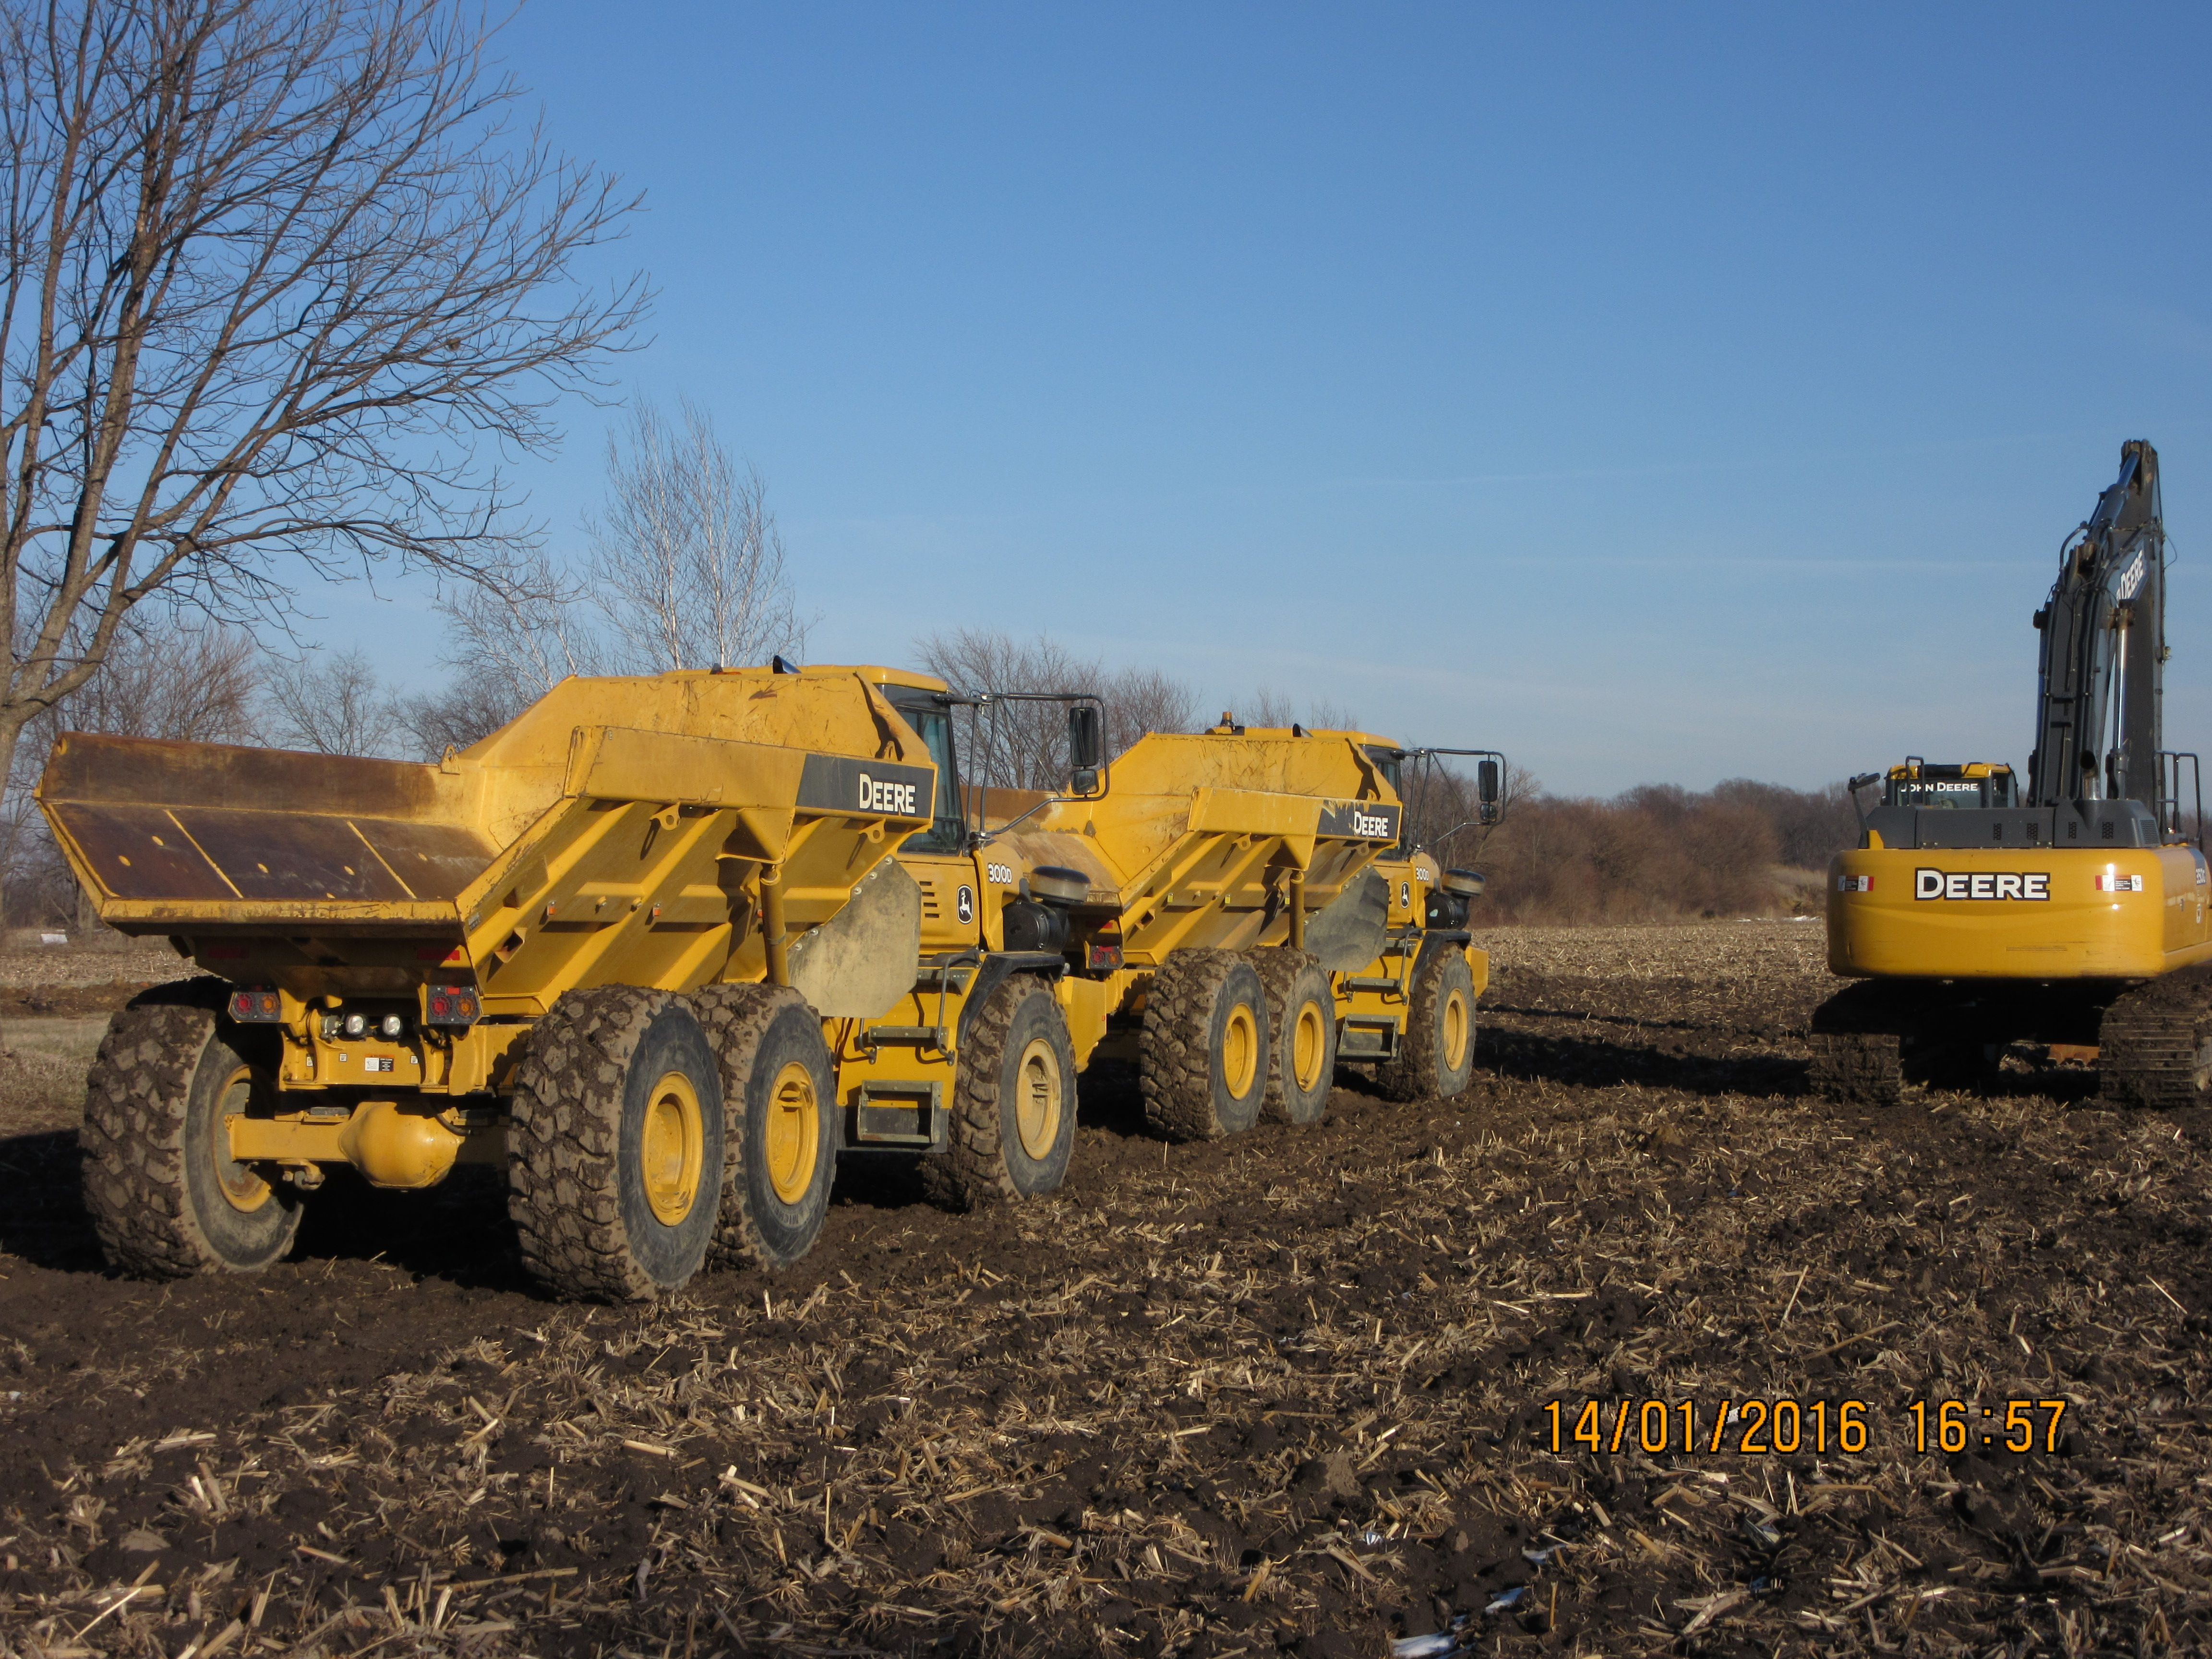 john deere 350g lc hydraulic excavator u0026 300d adts articulated